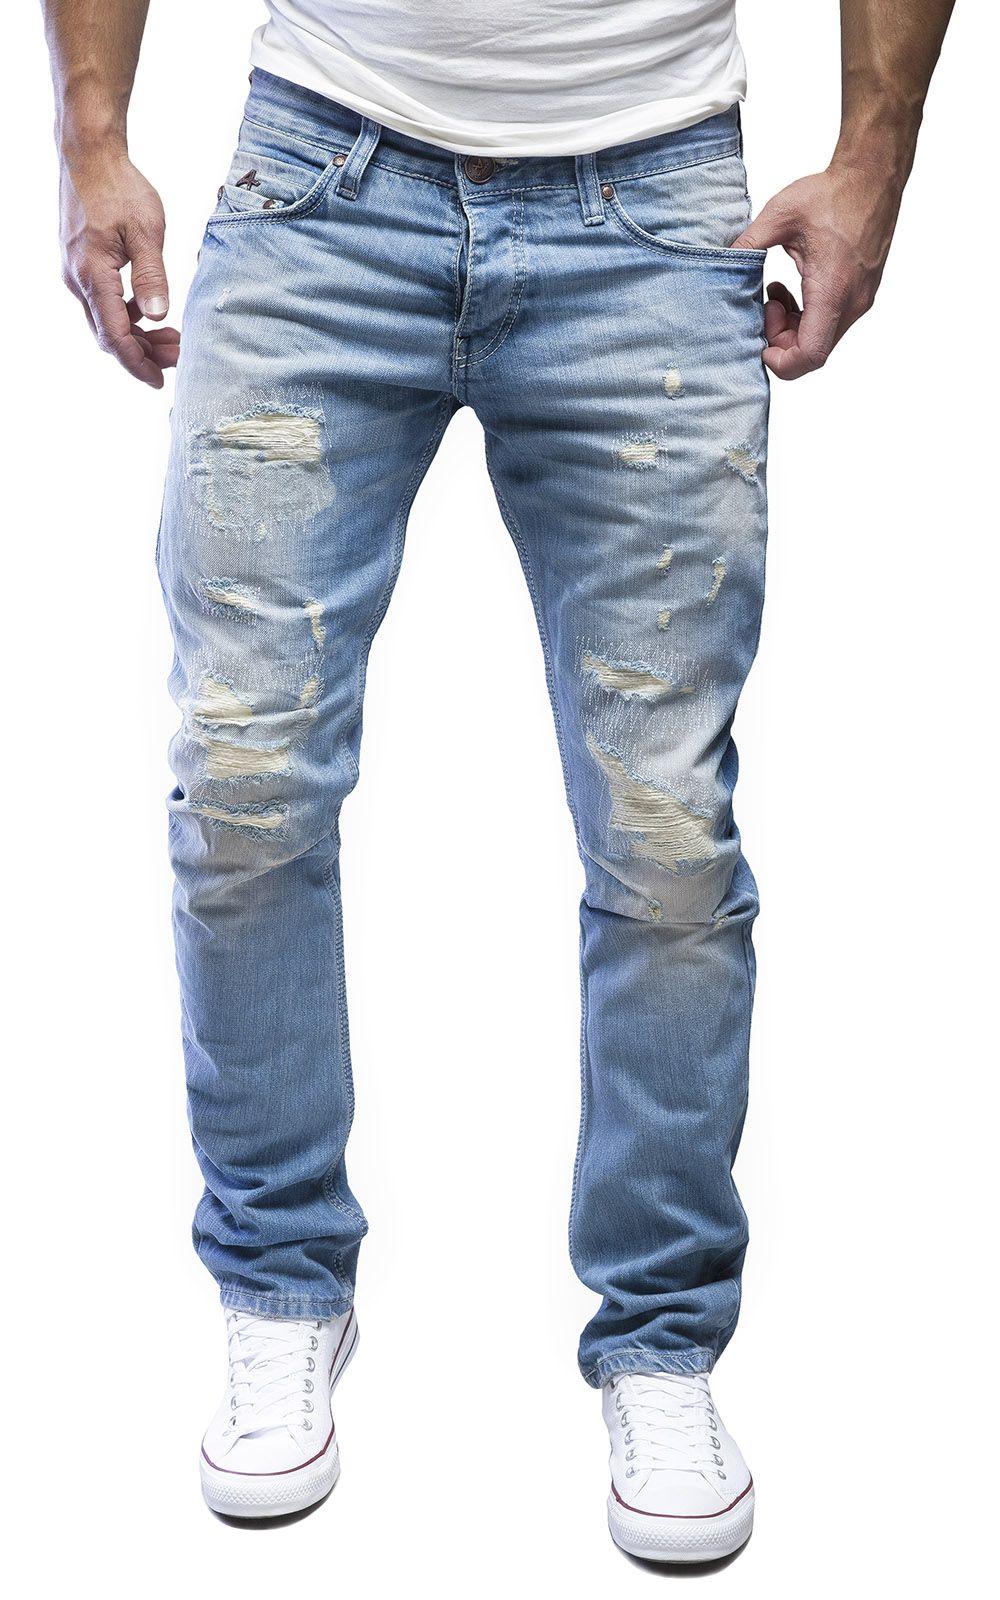 AMICA by MERISH Herren Straight Fit Destroyed Blue Jeans Hose Blau Neu J1154 6a296d07b54e